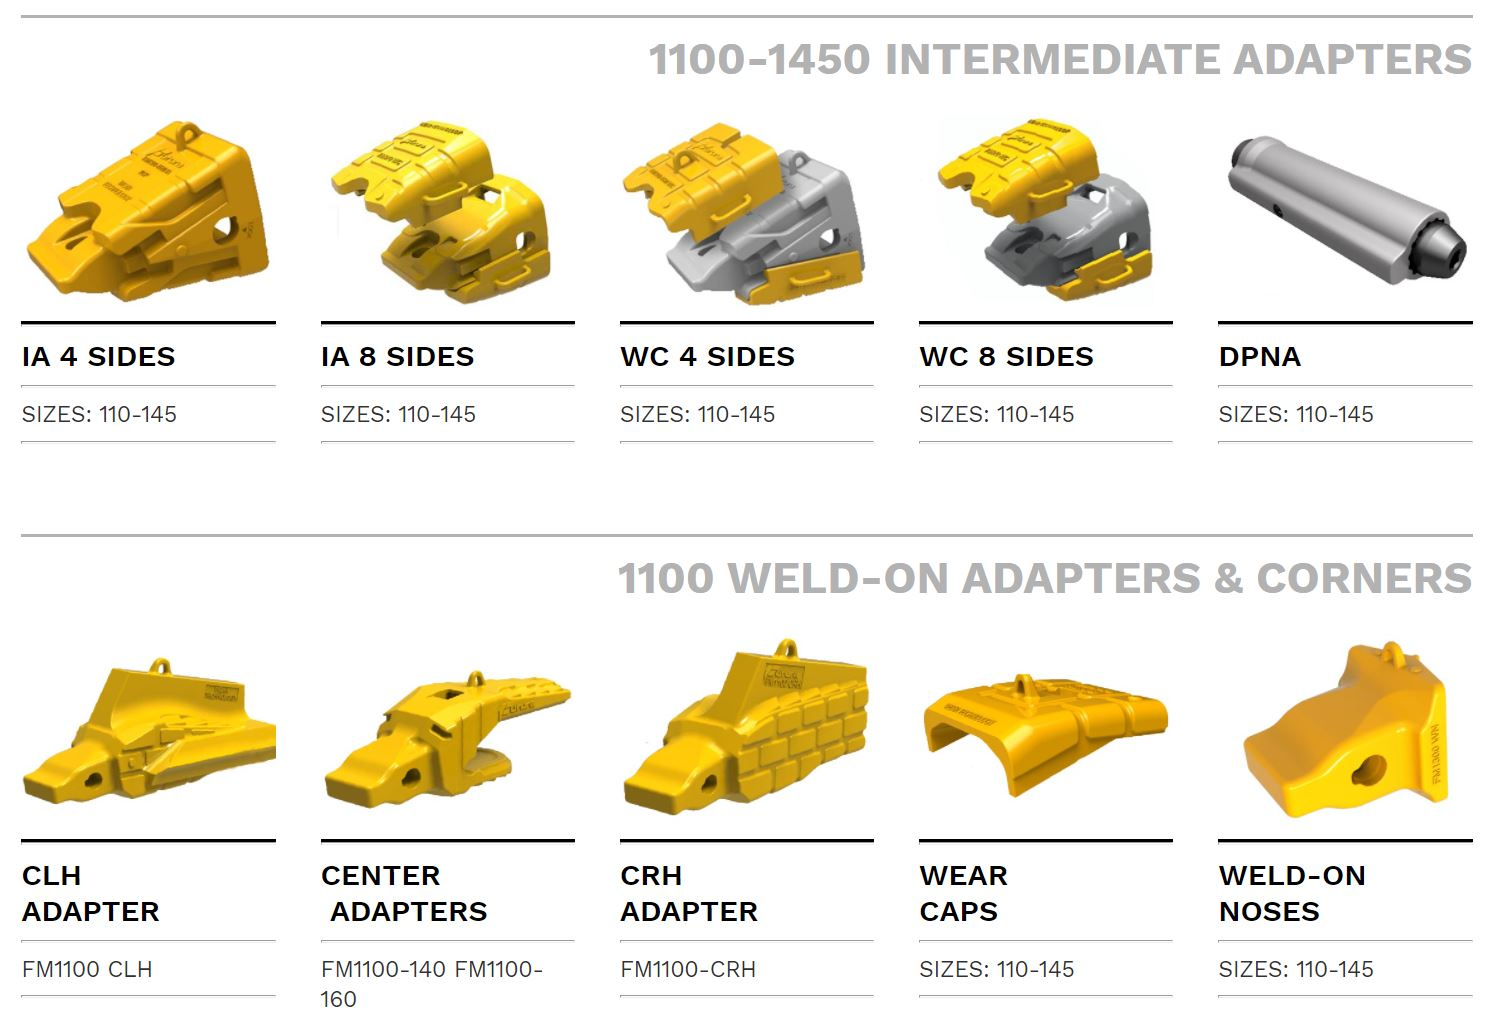 mineradapters